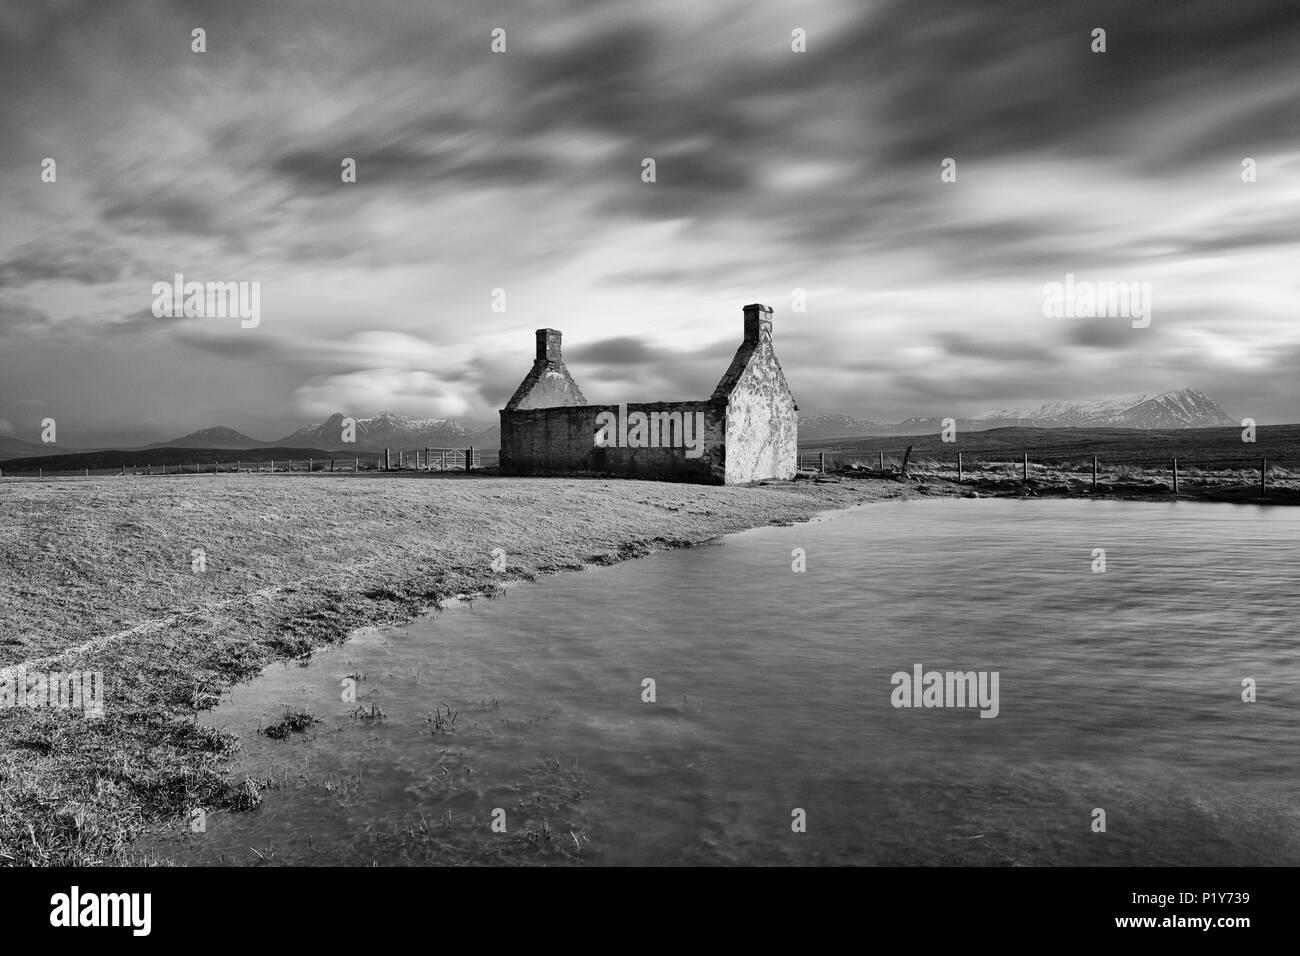 Moine cottage, Sutherland - Stock Image